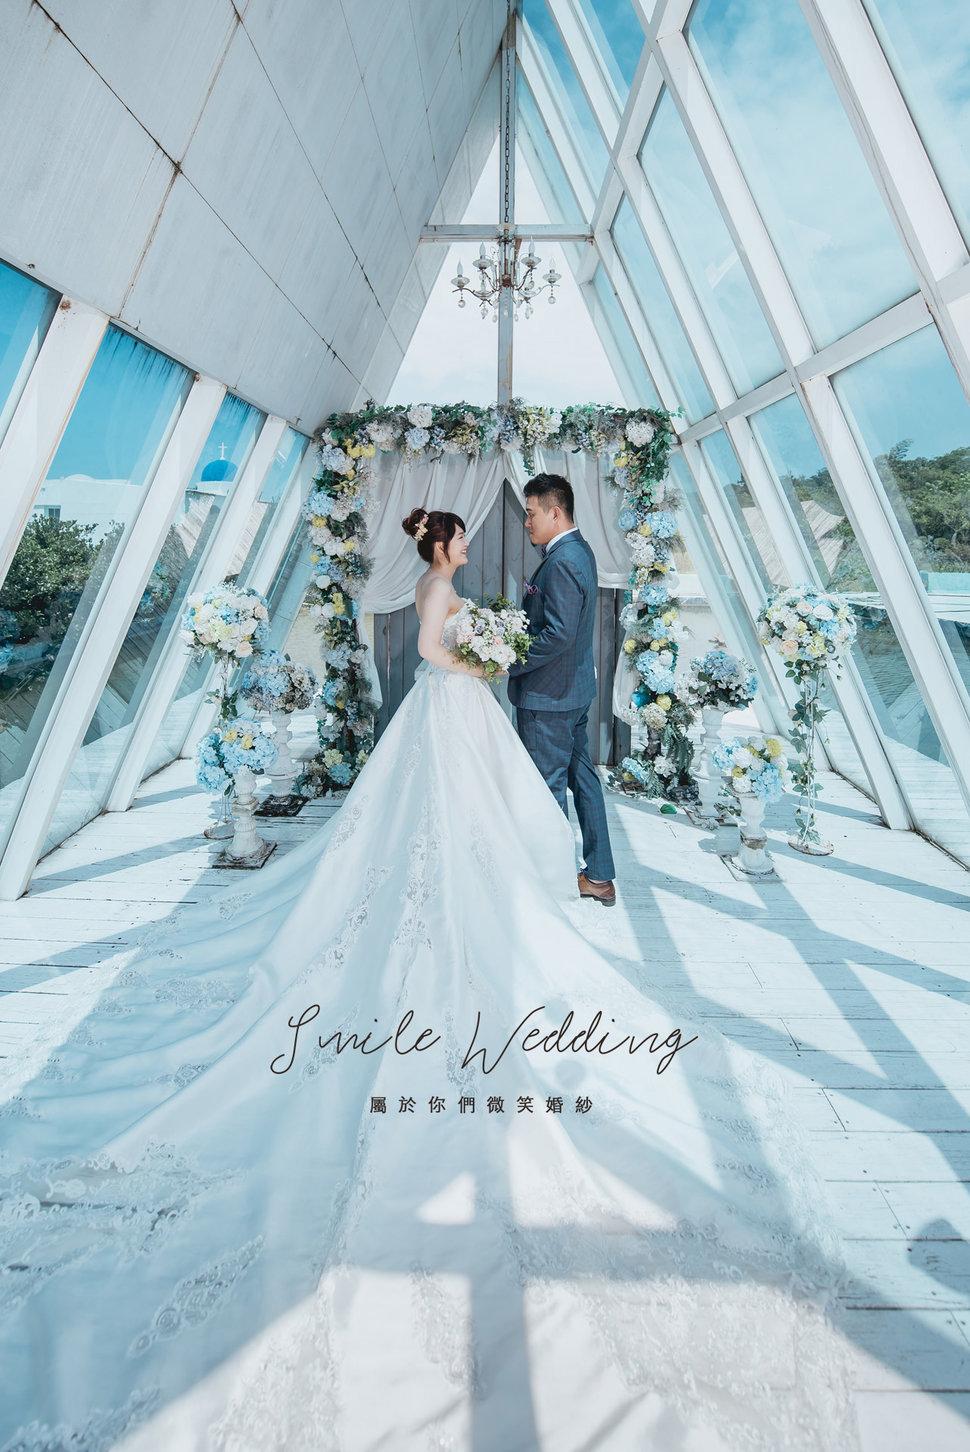 WEI_4380 - Smile wedding 微笑婚紗《結婚吧》